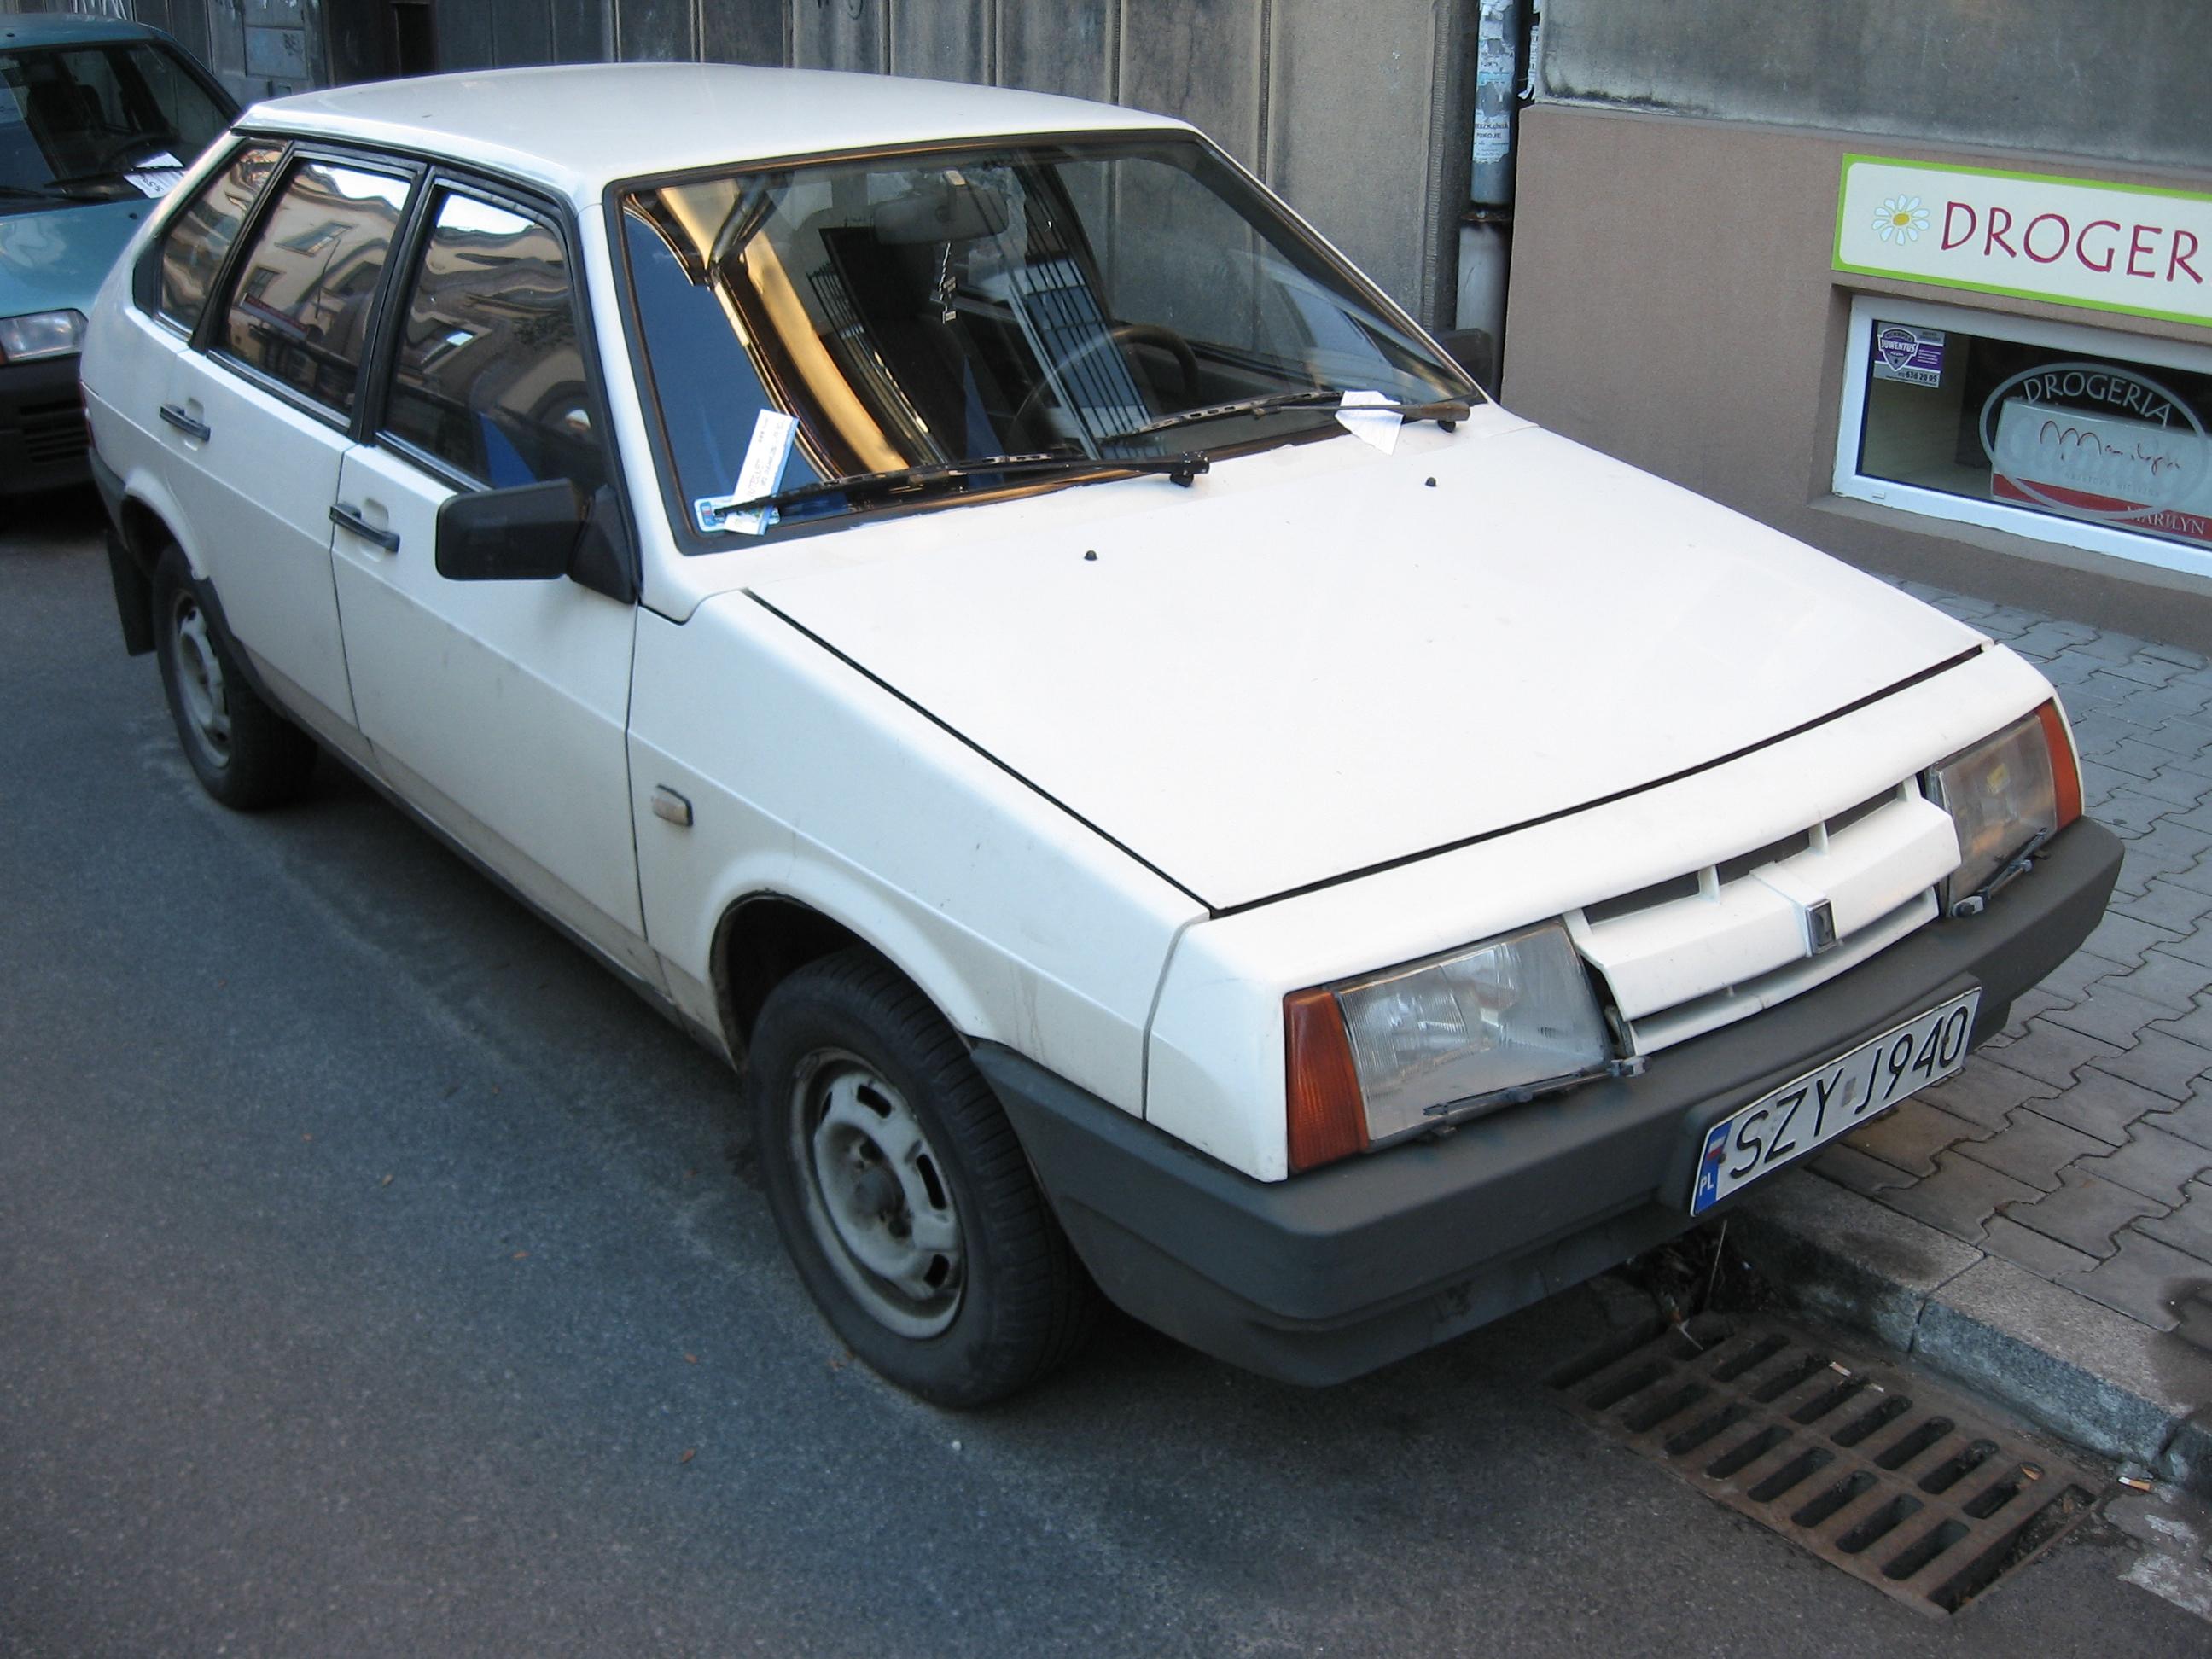 File:Lada Samara 2109 in Kraków (2).jpg